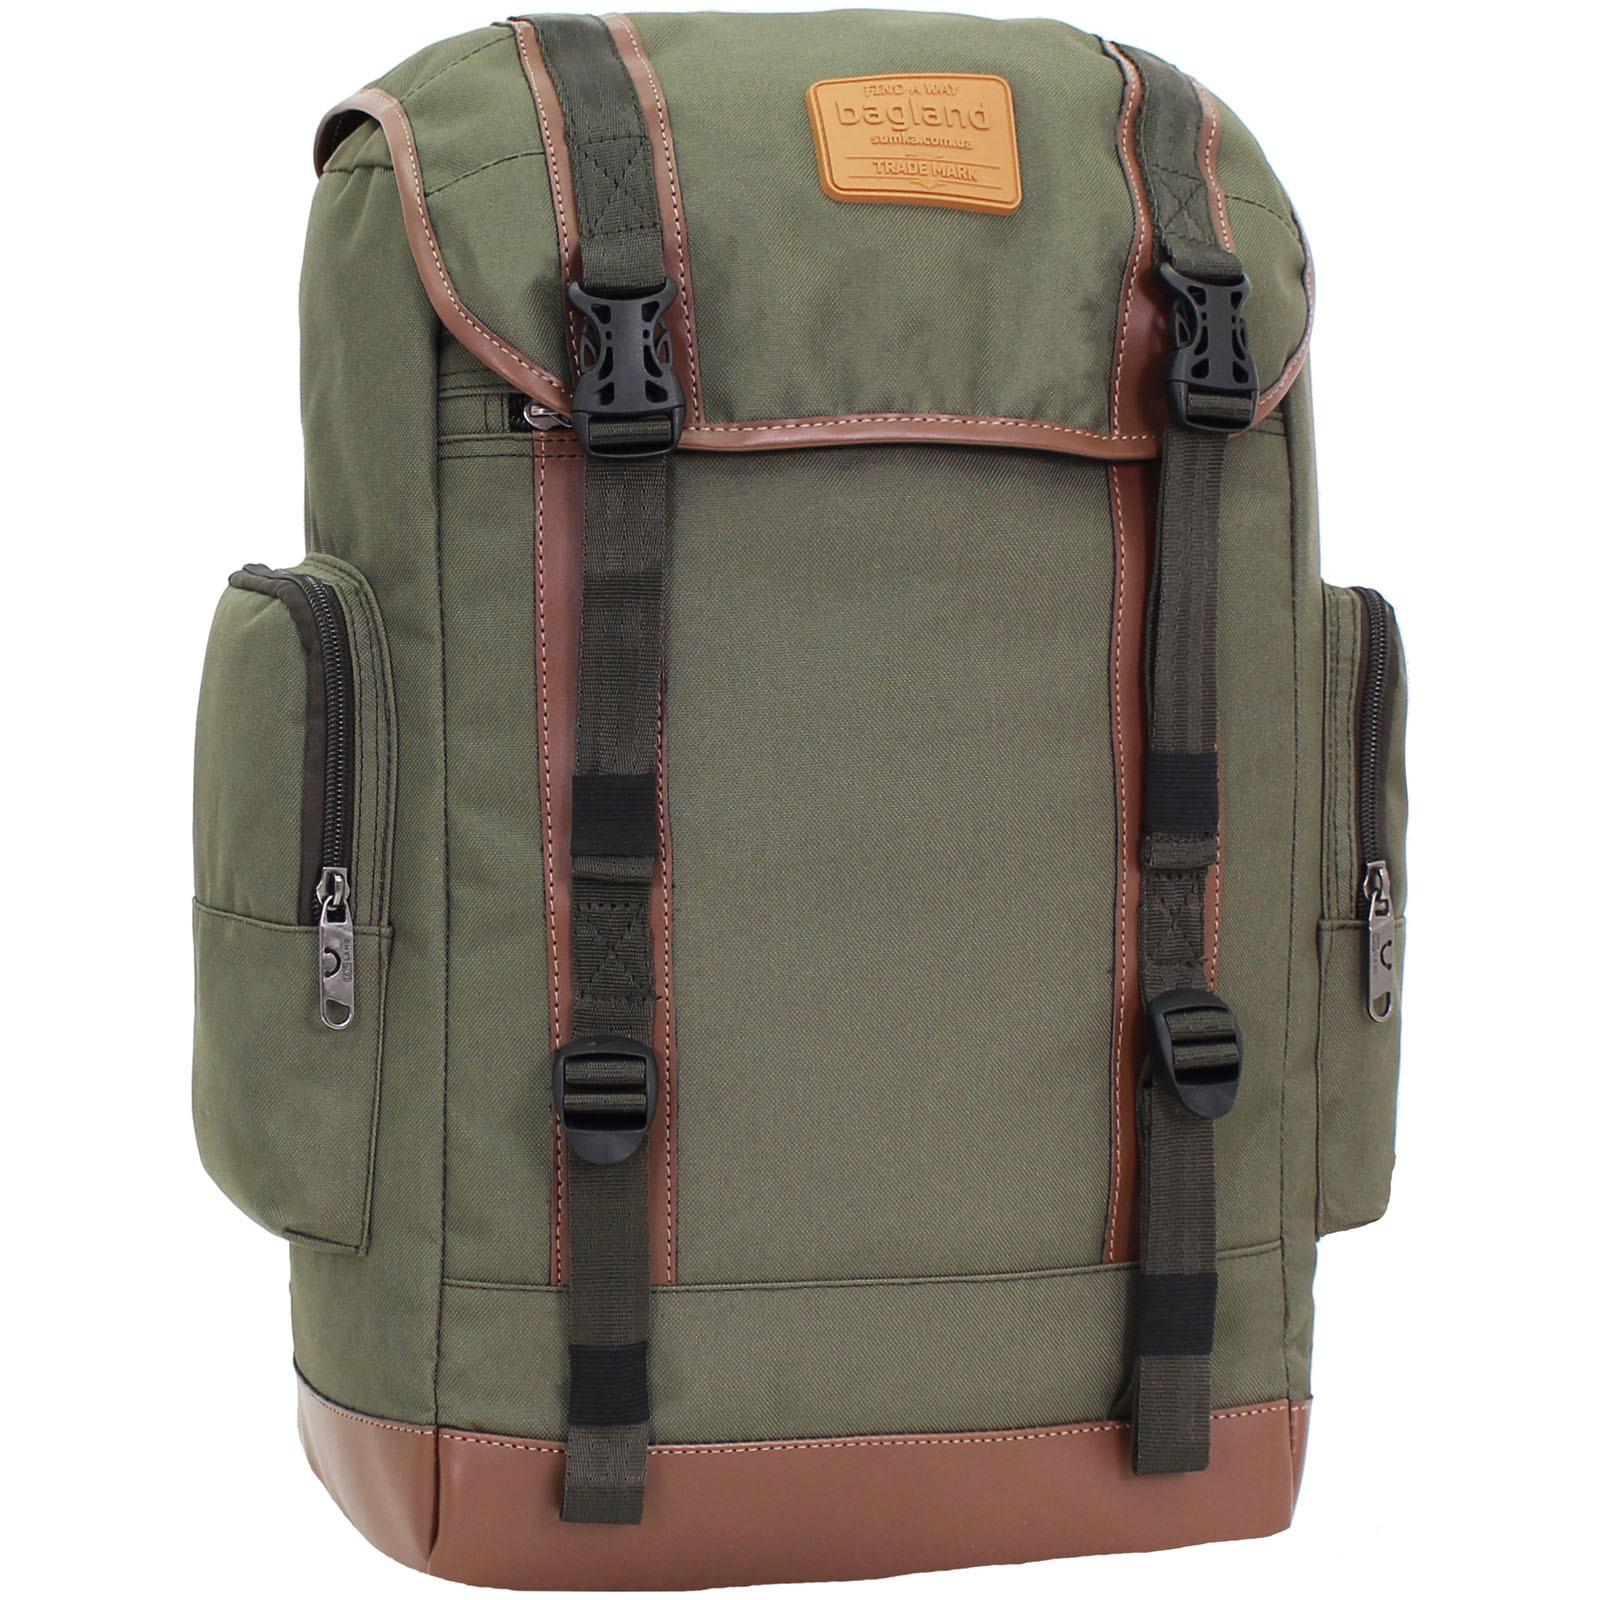 Городские рюкзаки Рюкзак для ноутбука Bagland Palermo 25 л. Хаки (0017966) IMG_9365.JPG